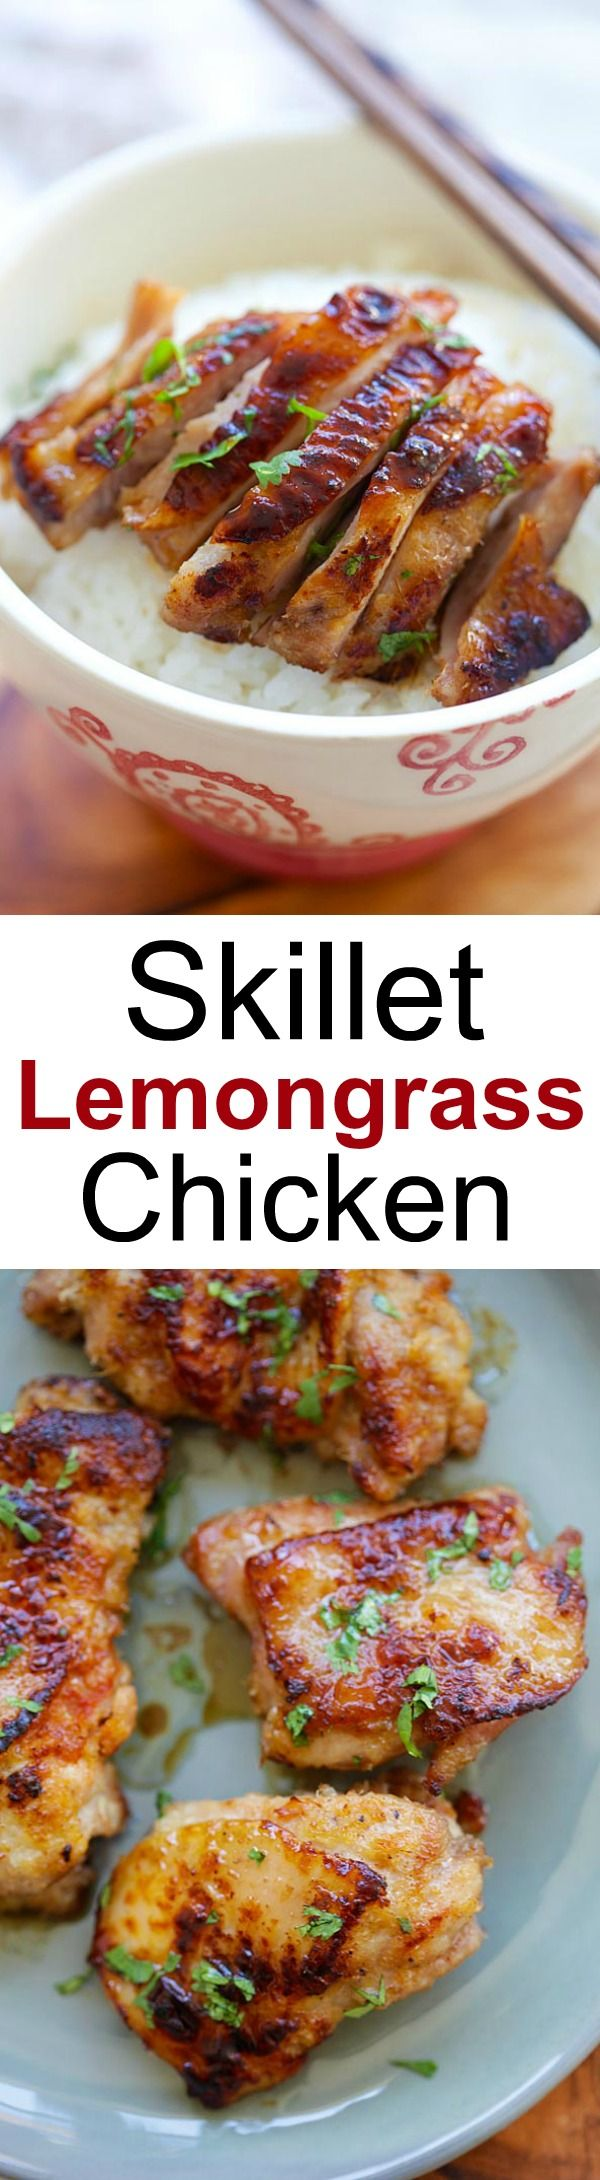 Skillet Lemongrass Chicken from rasamalaysia.com